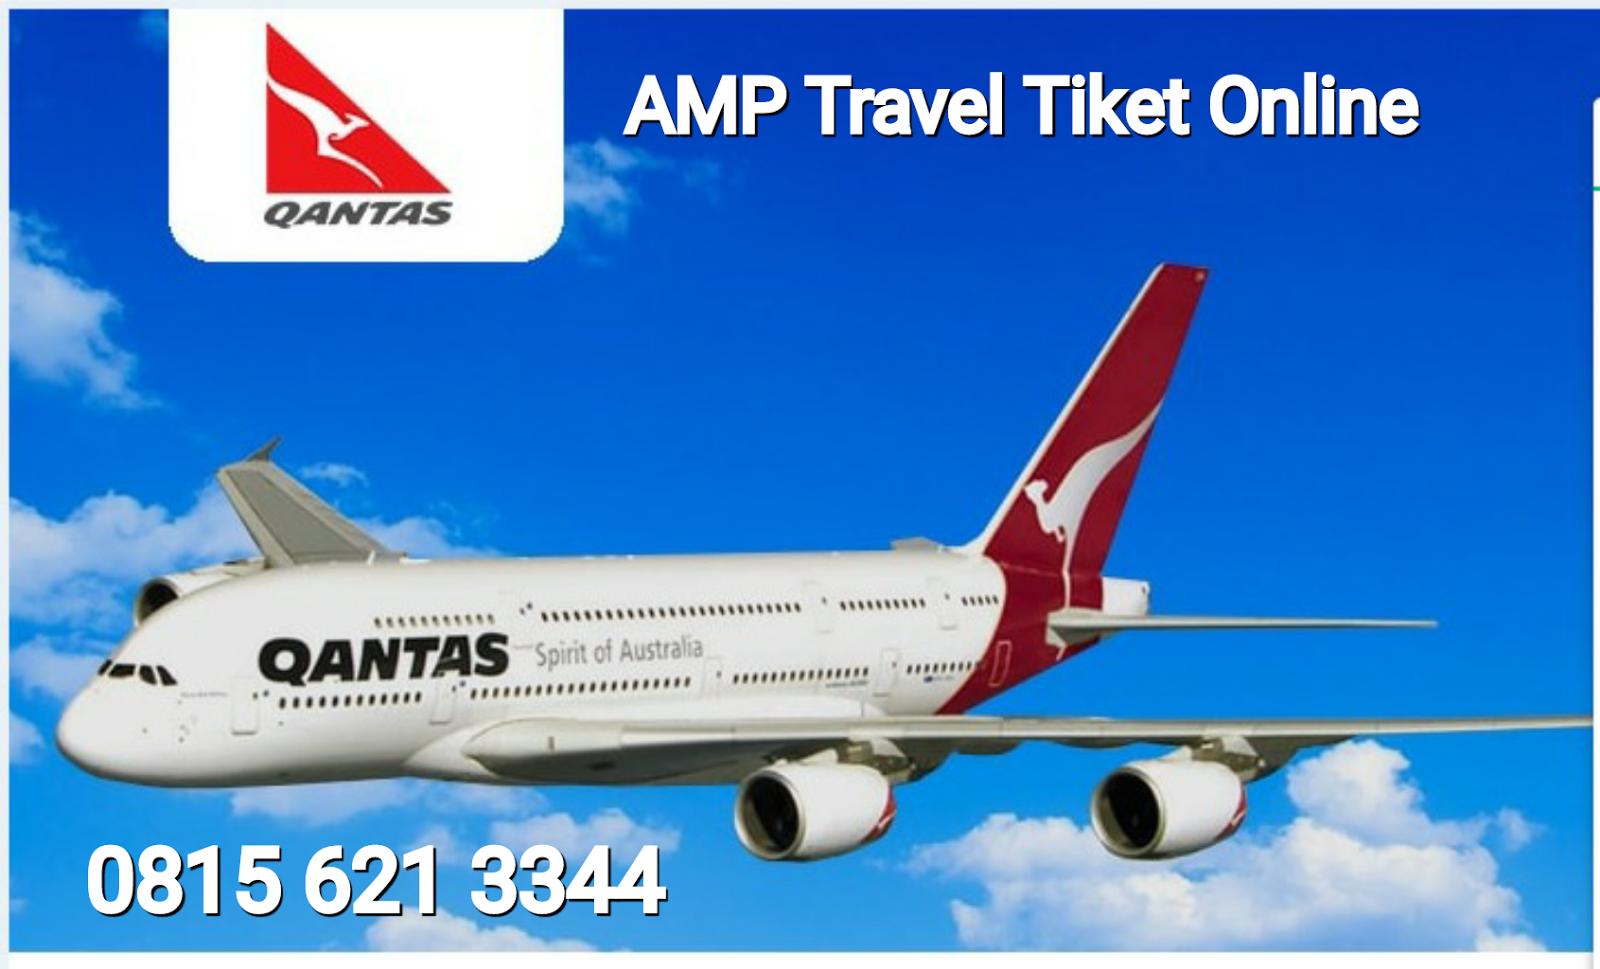 AMP Travel Tiket Online